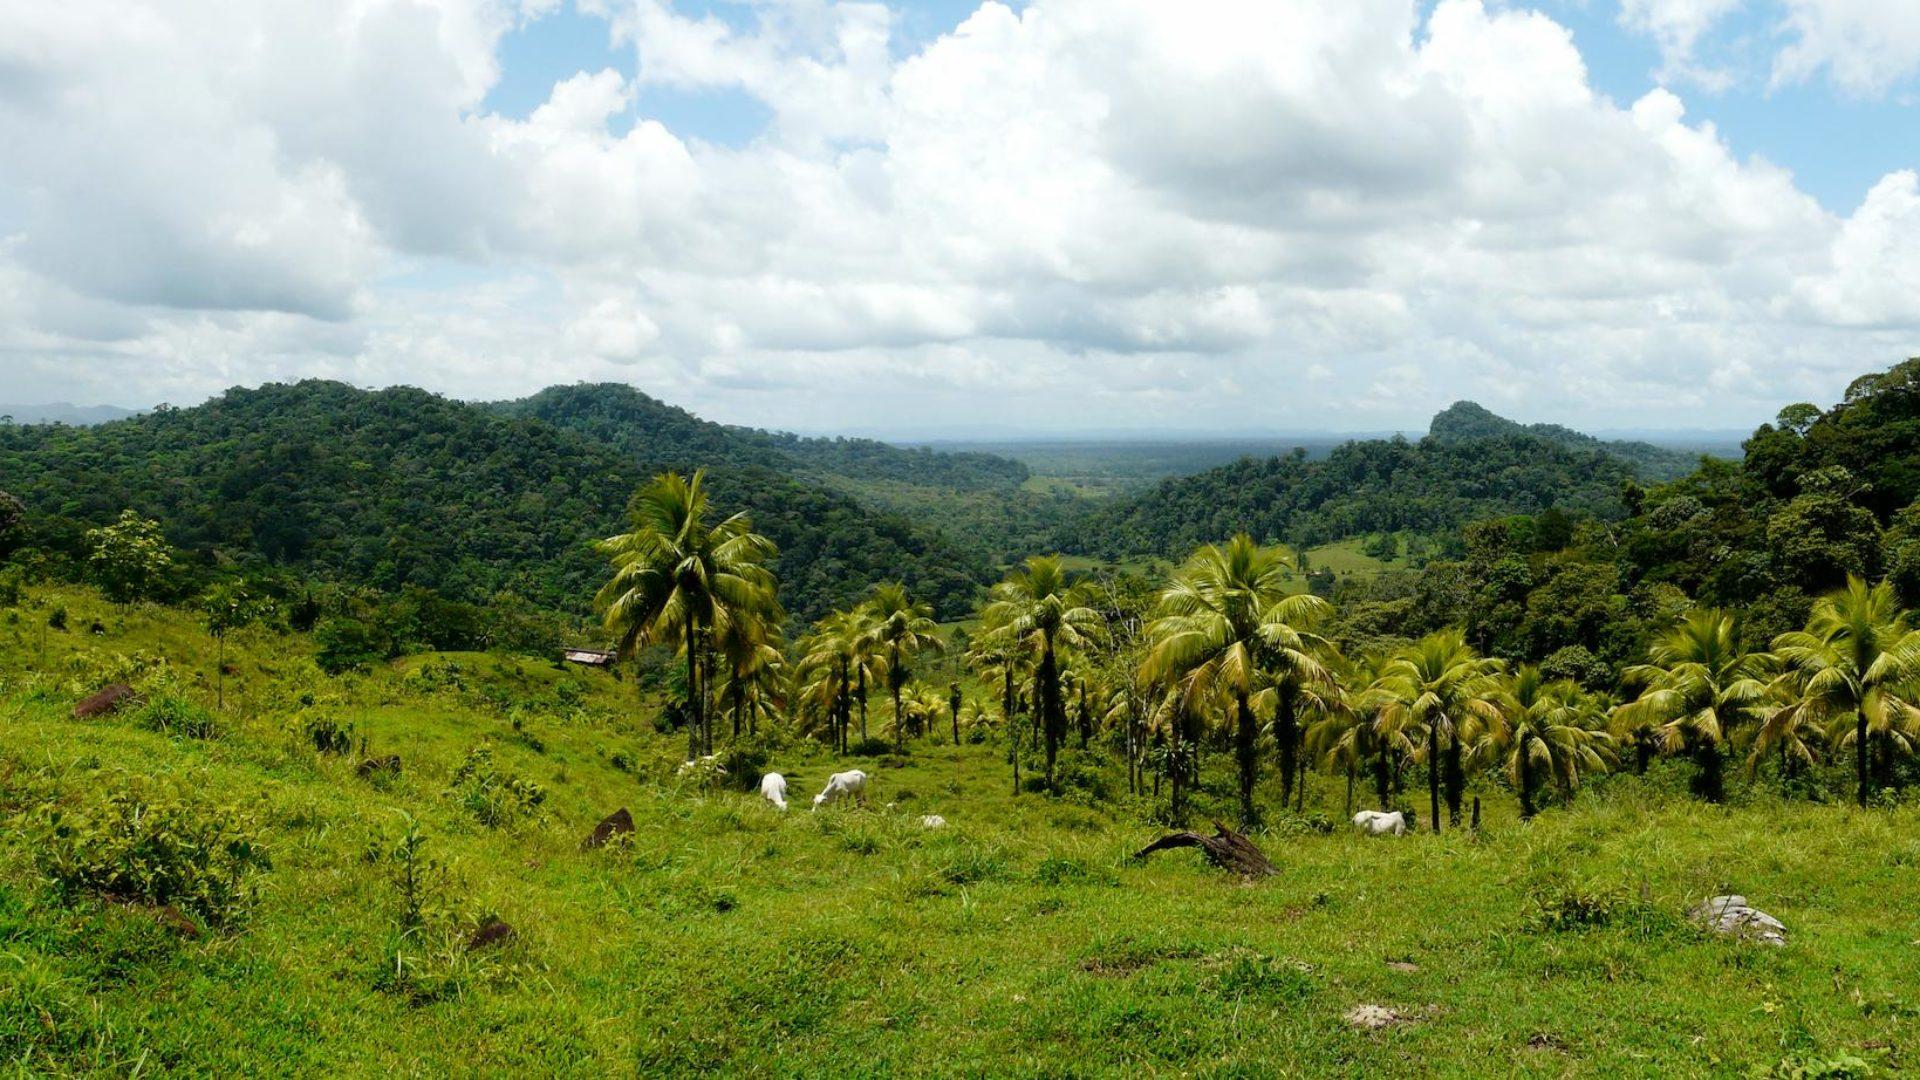 Visionswald in Costa Rica